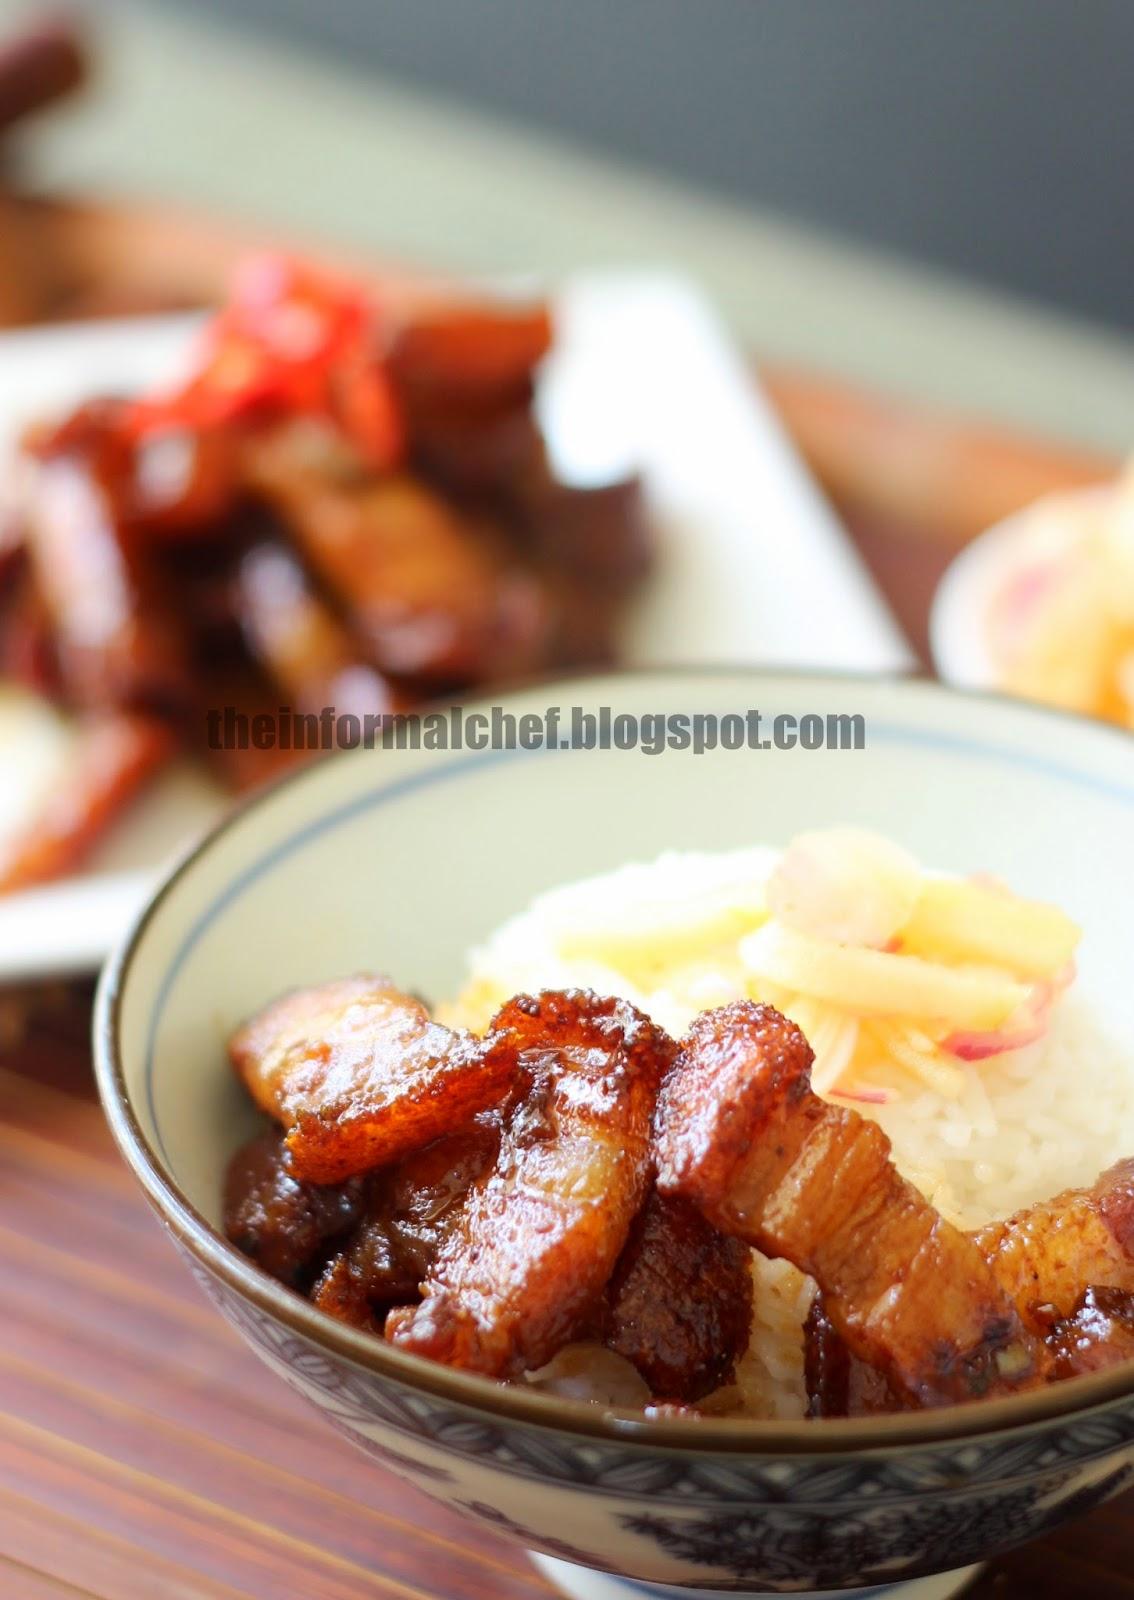 The Informal Chef: Stir-Fry Caramelised Roasted Pork Belly (Siew Yuk